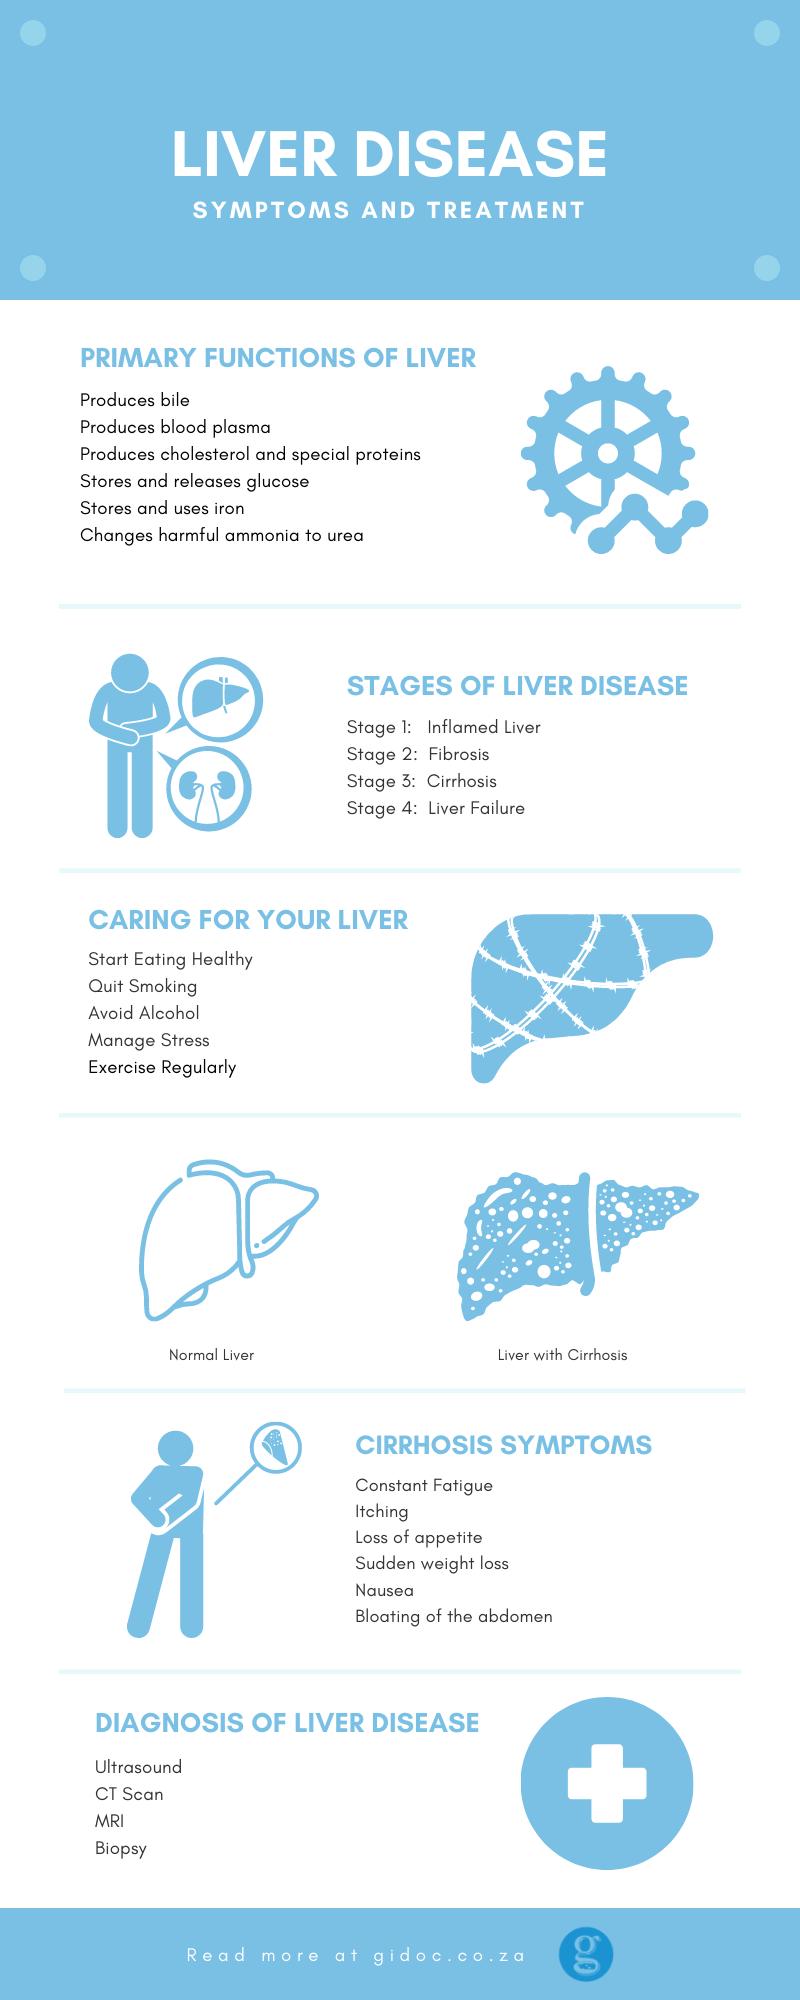 Liver-Disease-Symptoms-Treatment-infographic